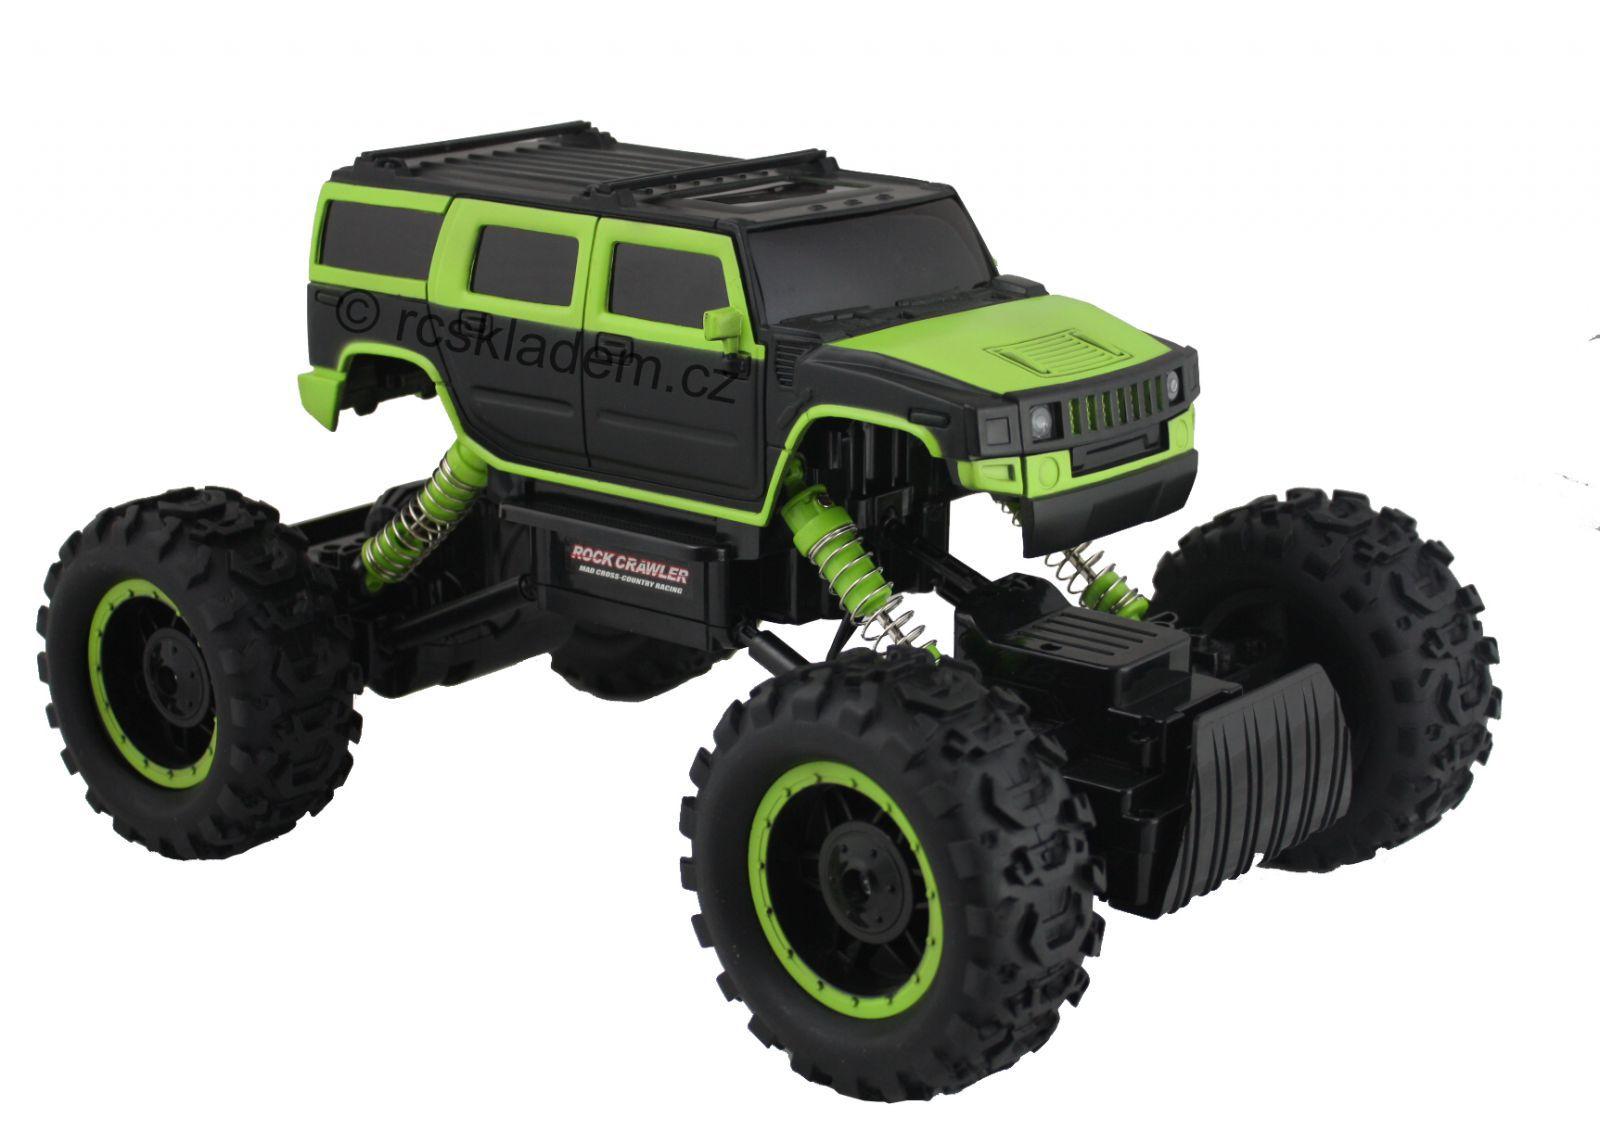 Hummer-Truck-Maistro